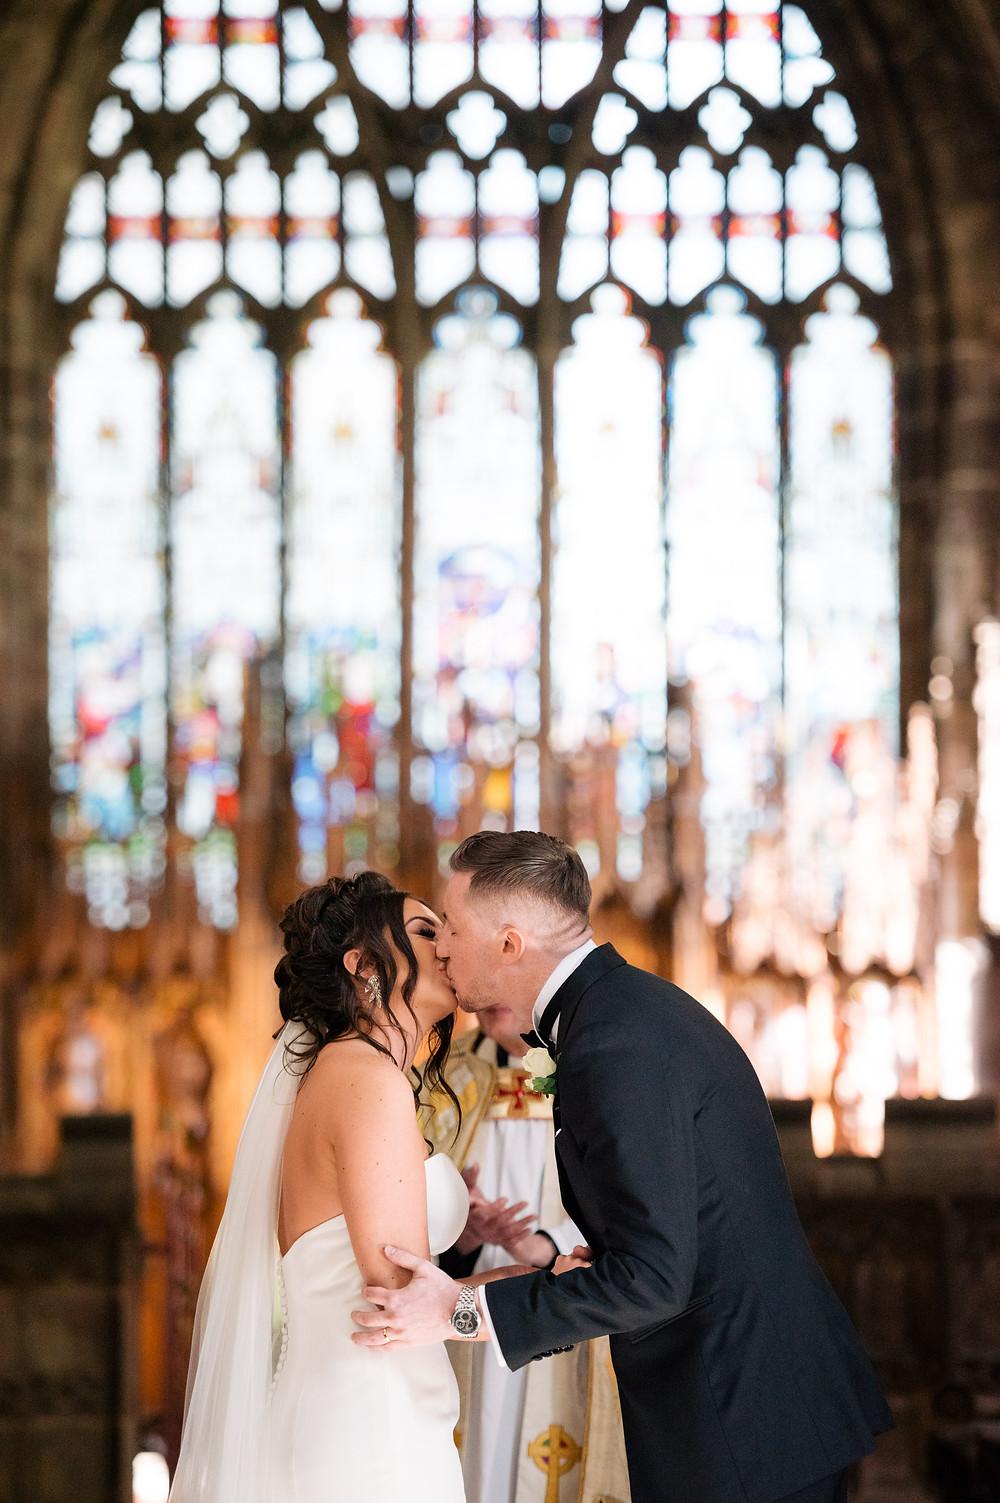 crewe and nantwich wedding photography, Dorfold Hall Wedding Photography